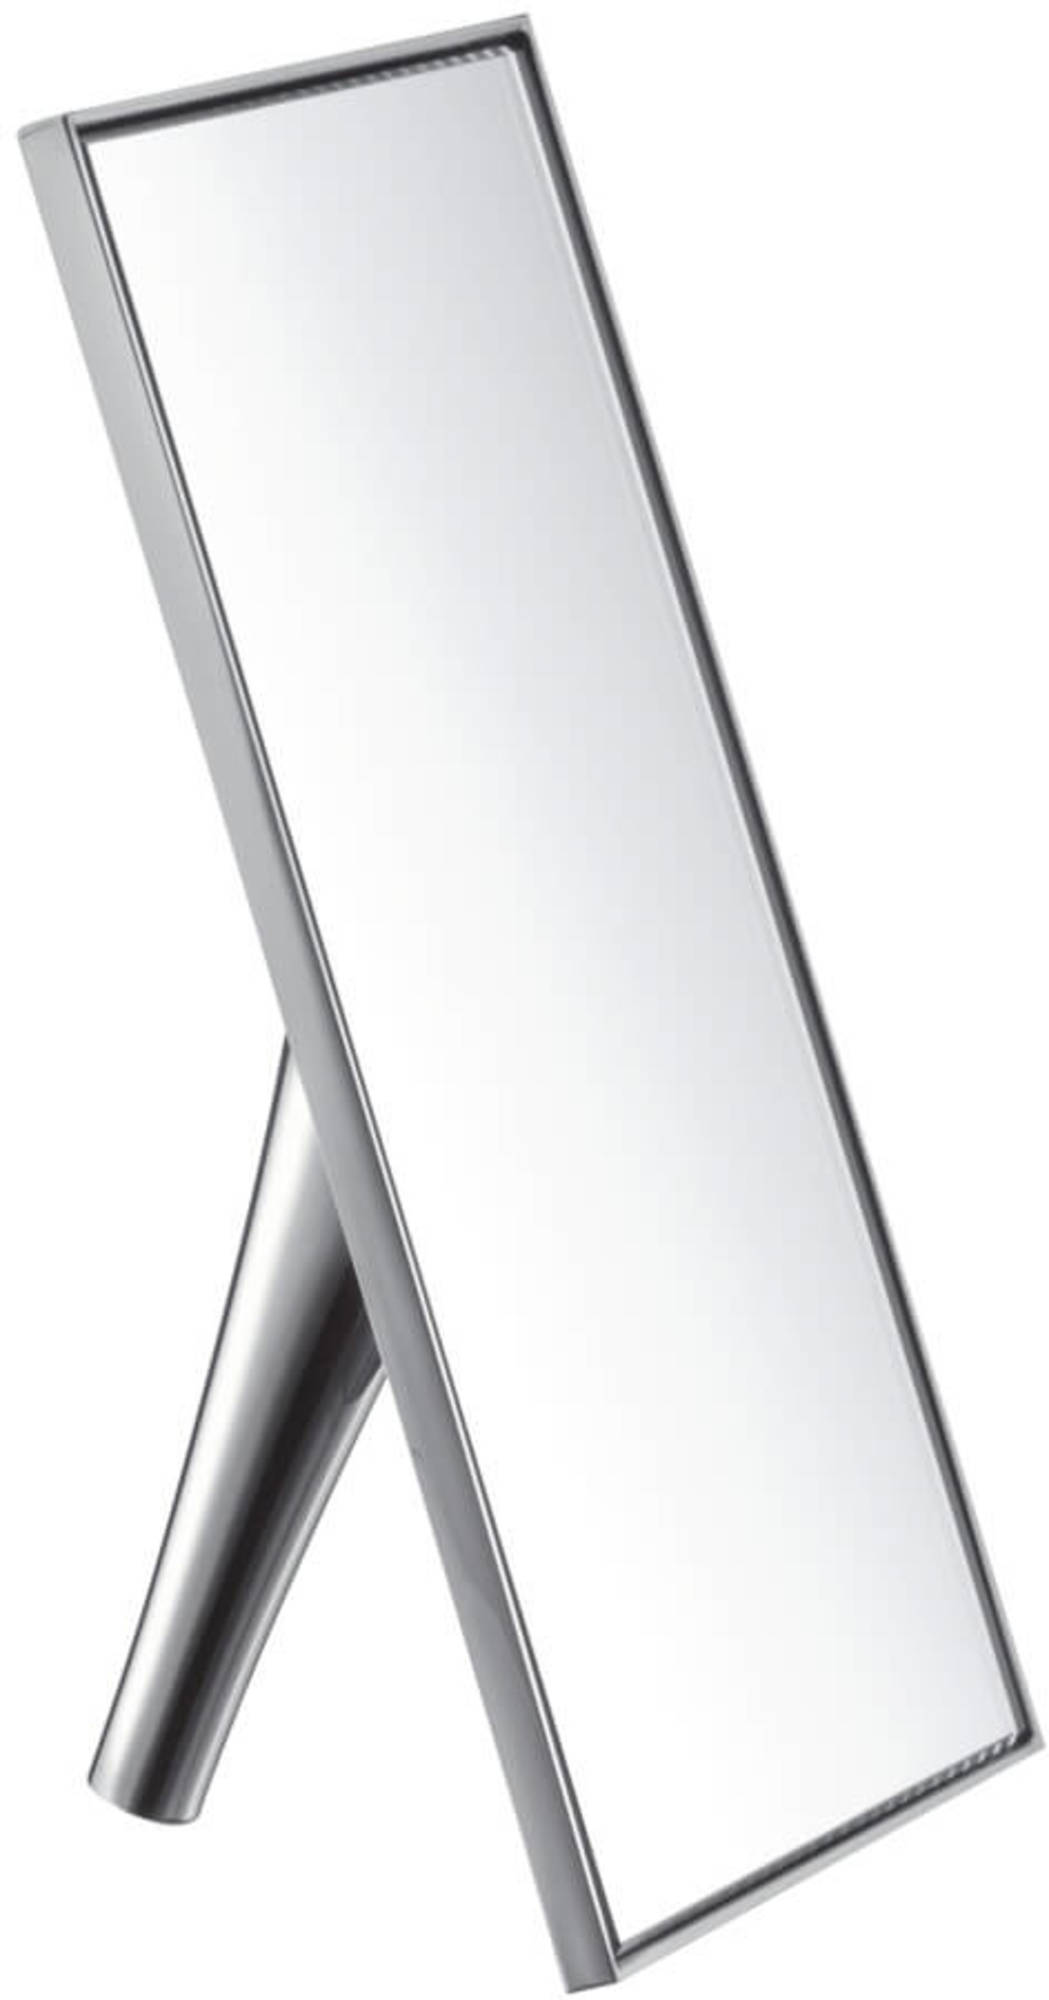 Hansgrohe AXOR Massaud staande spiegel tafelmodel chroom